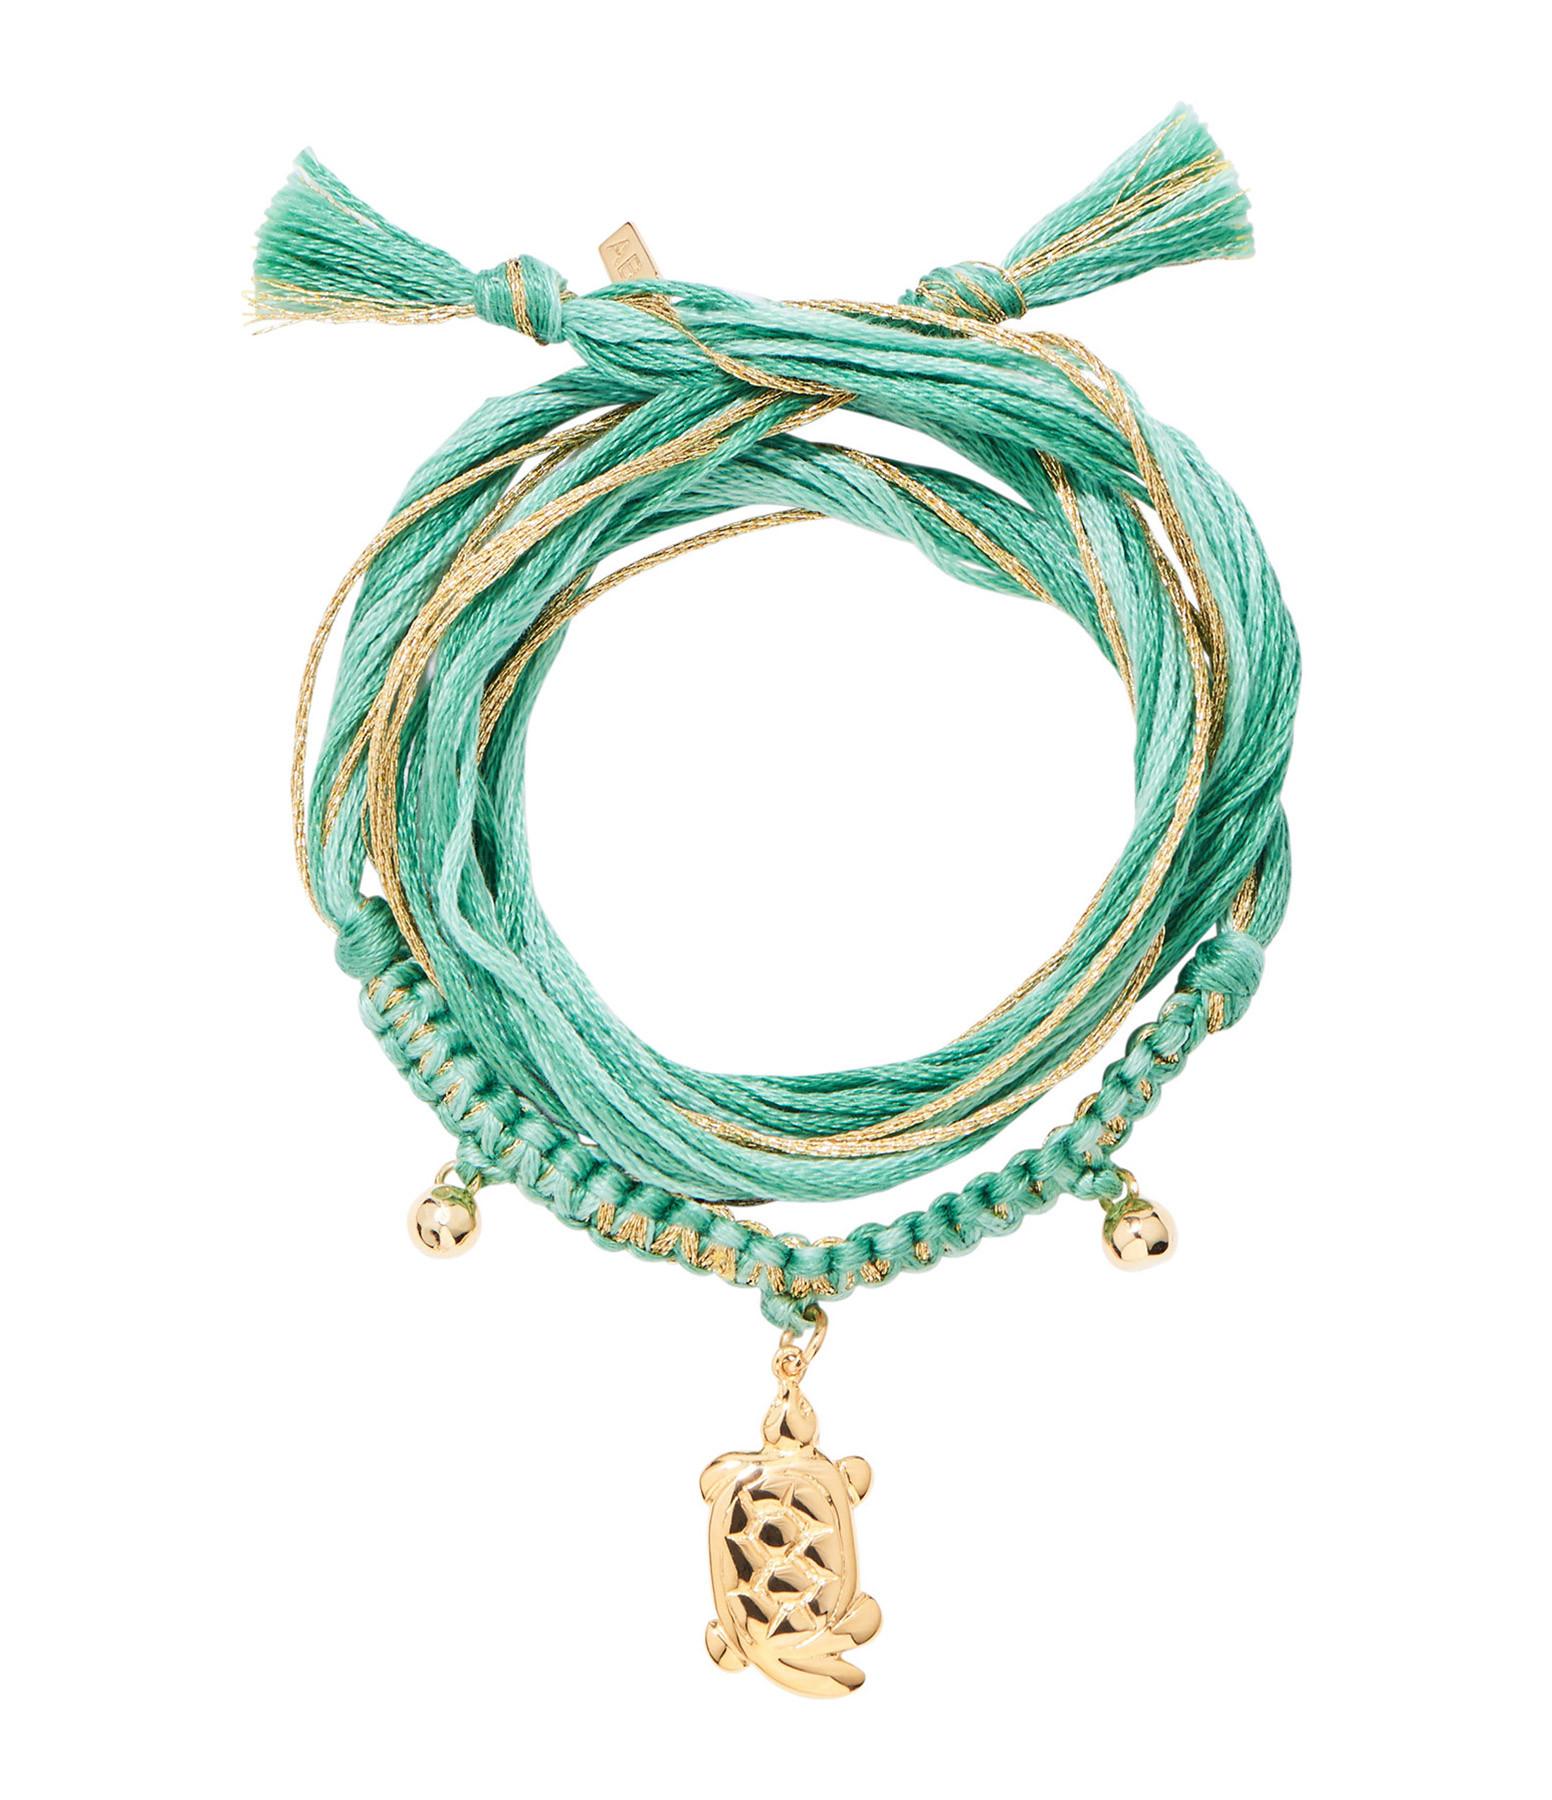 AURELIE BIDERMANN - Bracelet Honolulu Charm Tortue Vert Plaqué Or